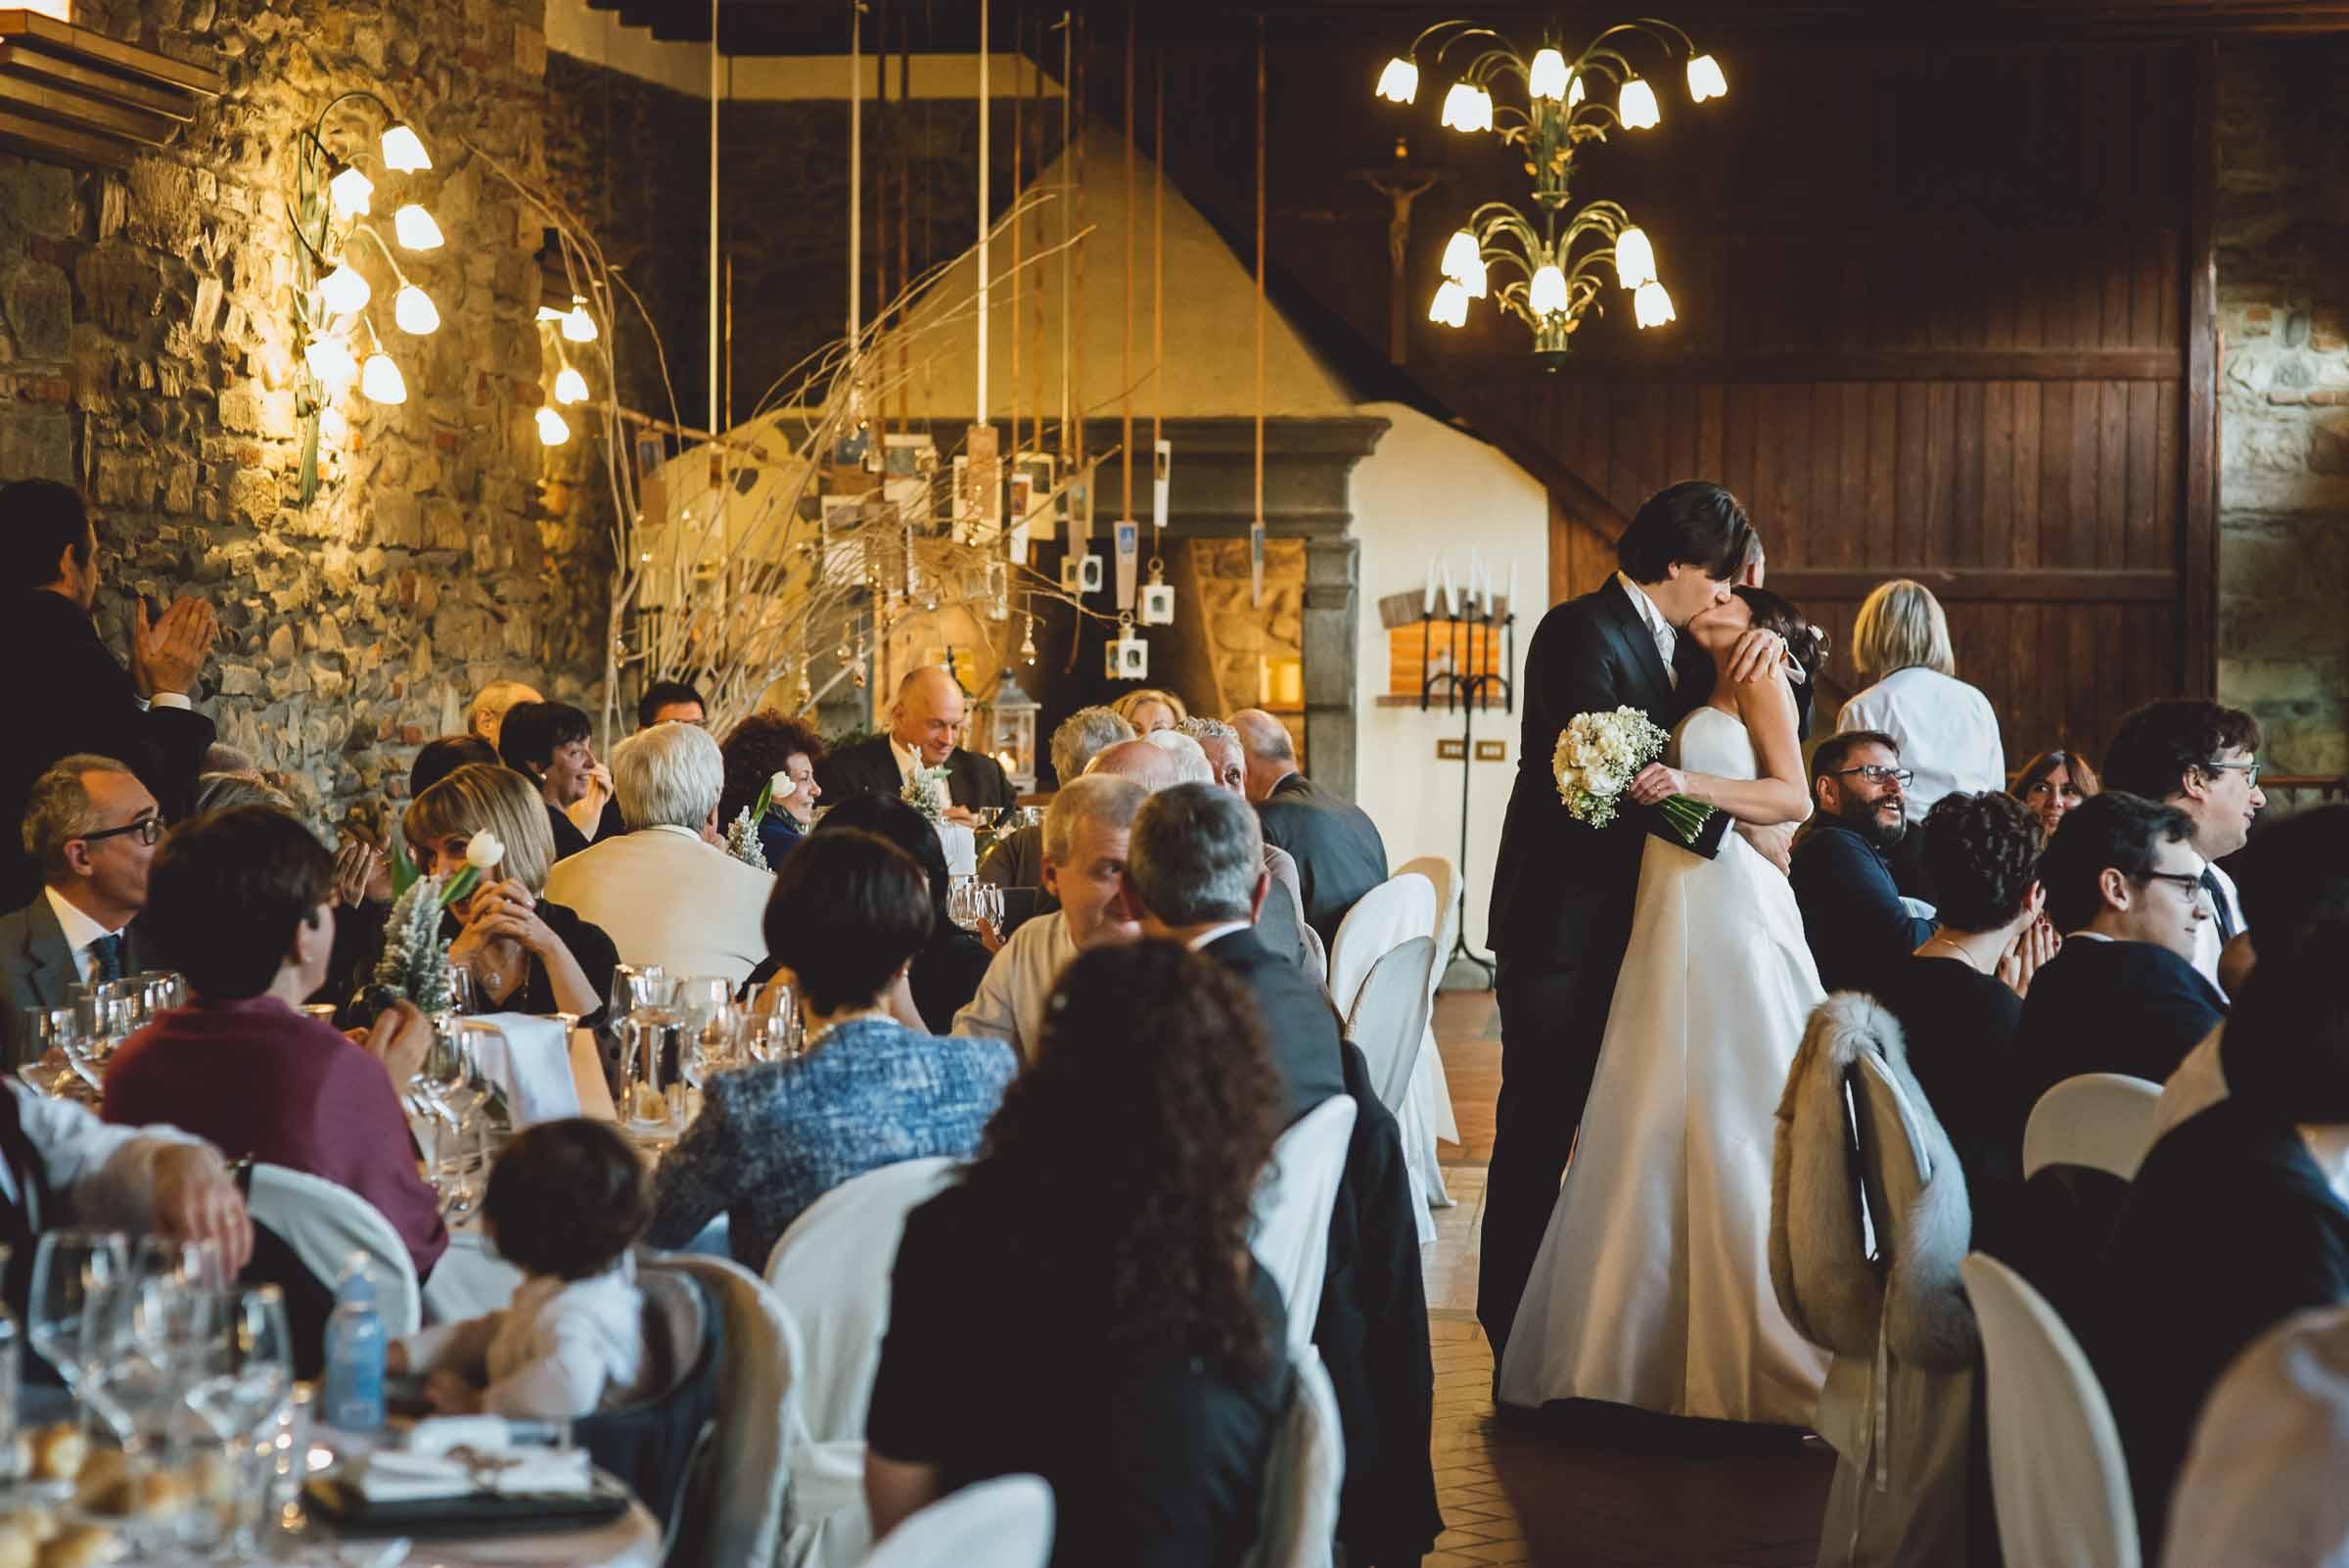 fotografo matrimonio milano wedding photography reportage max allegritti